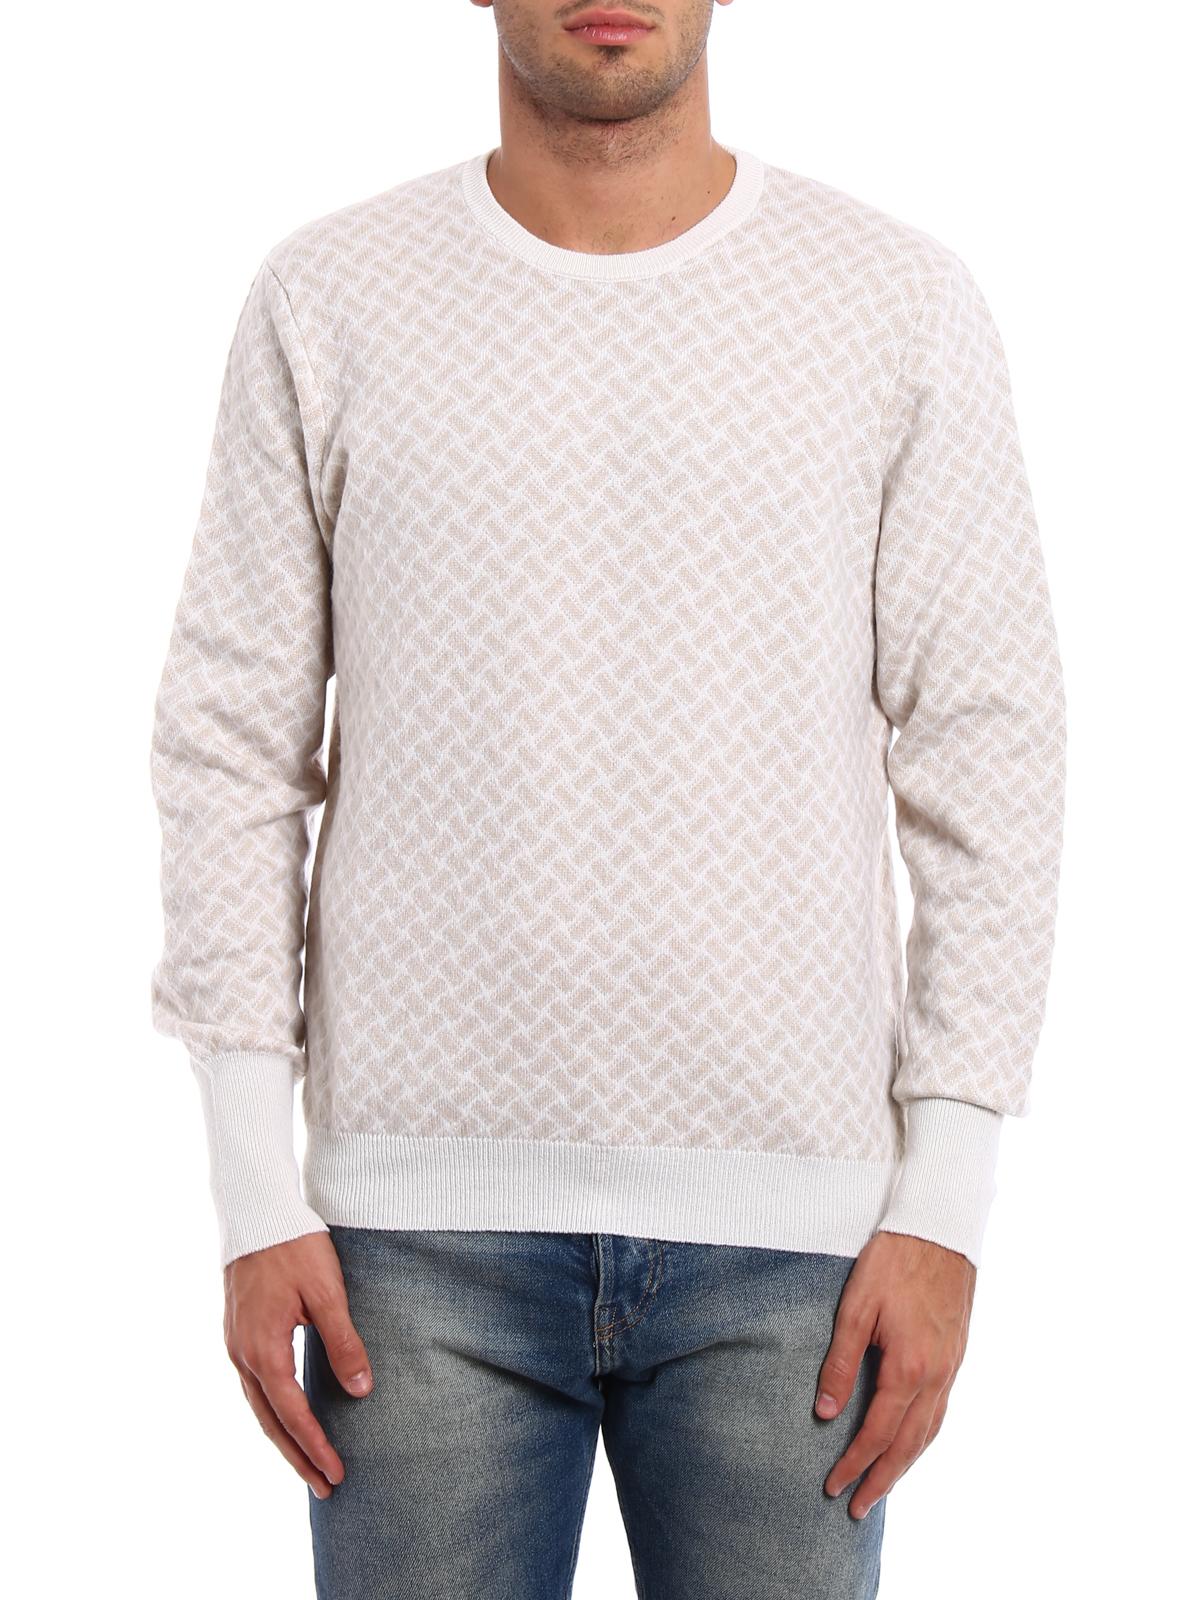 e895f3081151be Drumohr - Jacquard cashmere sweater - crew necks - D2K103AI11 ...